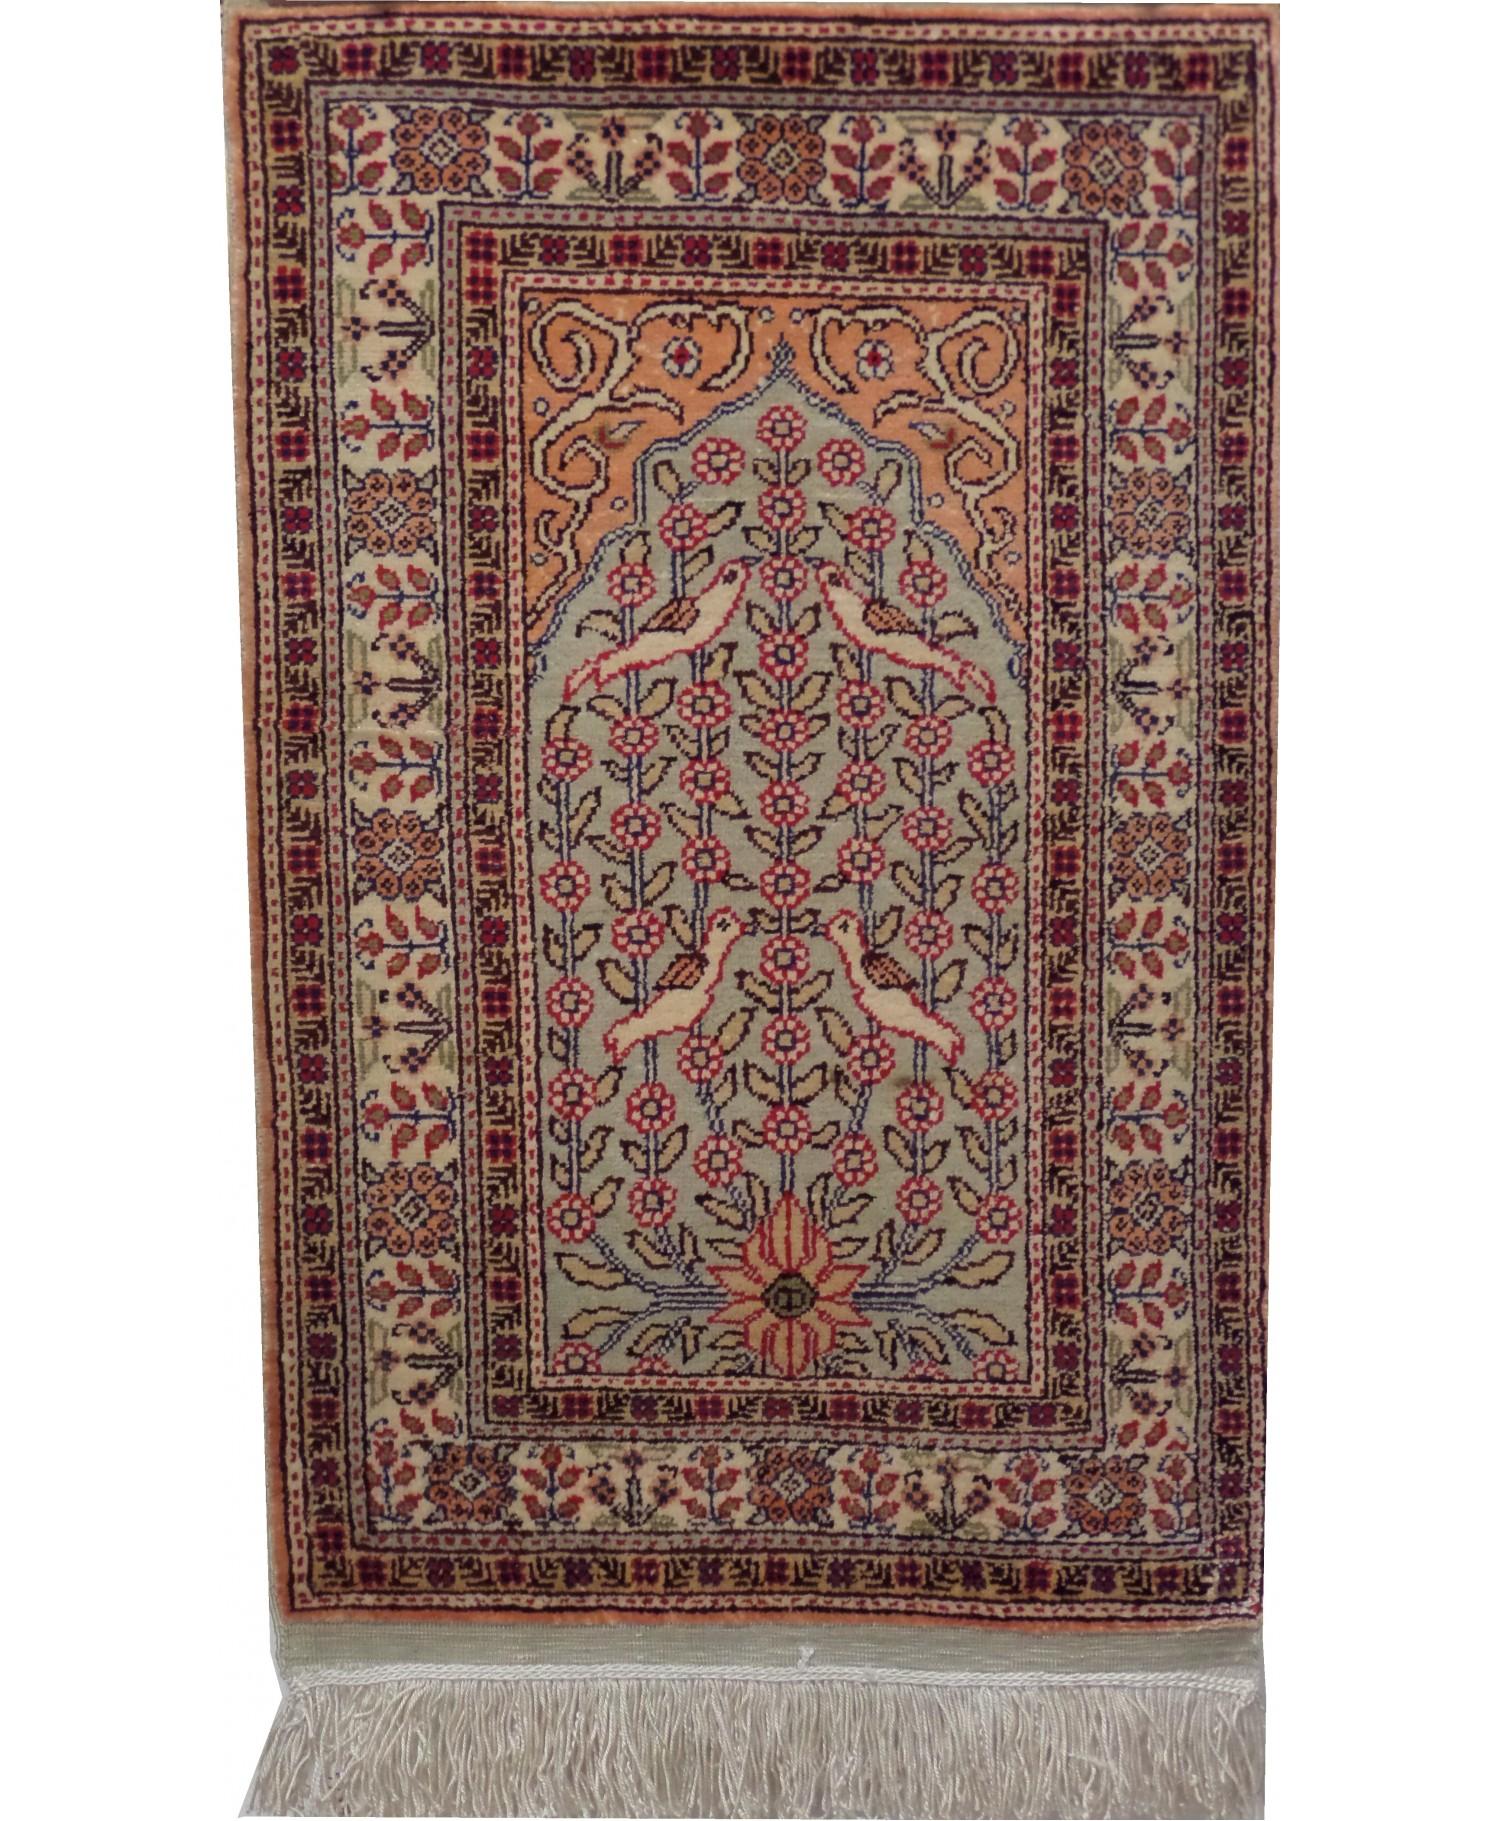 Handmade Turkish Kayseri Original Silk Carpet �C FREE SHIPPING..!1500 x 1821 jpeg 699kB